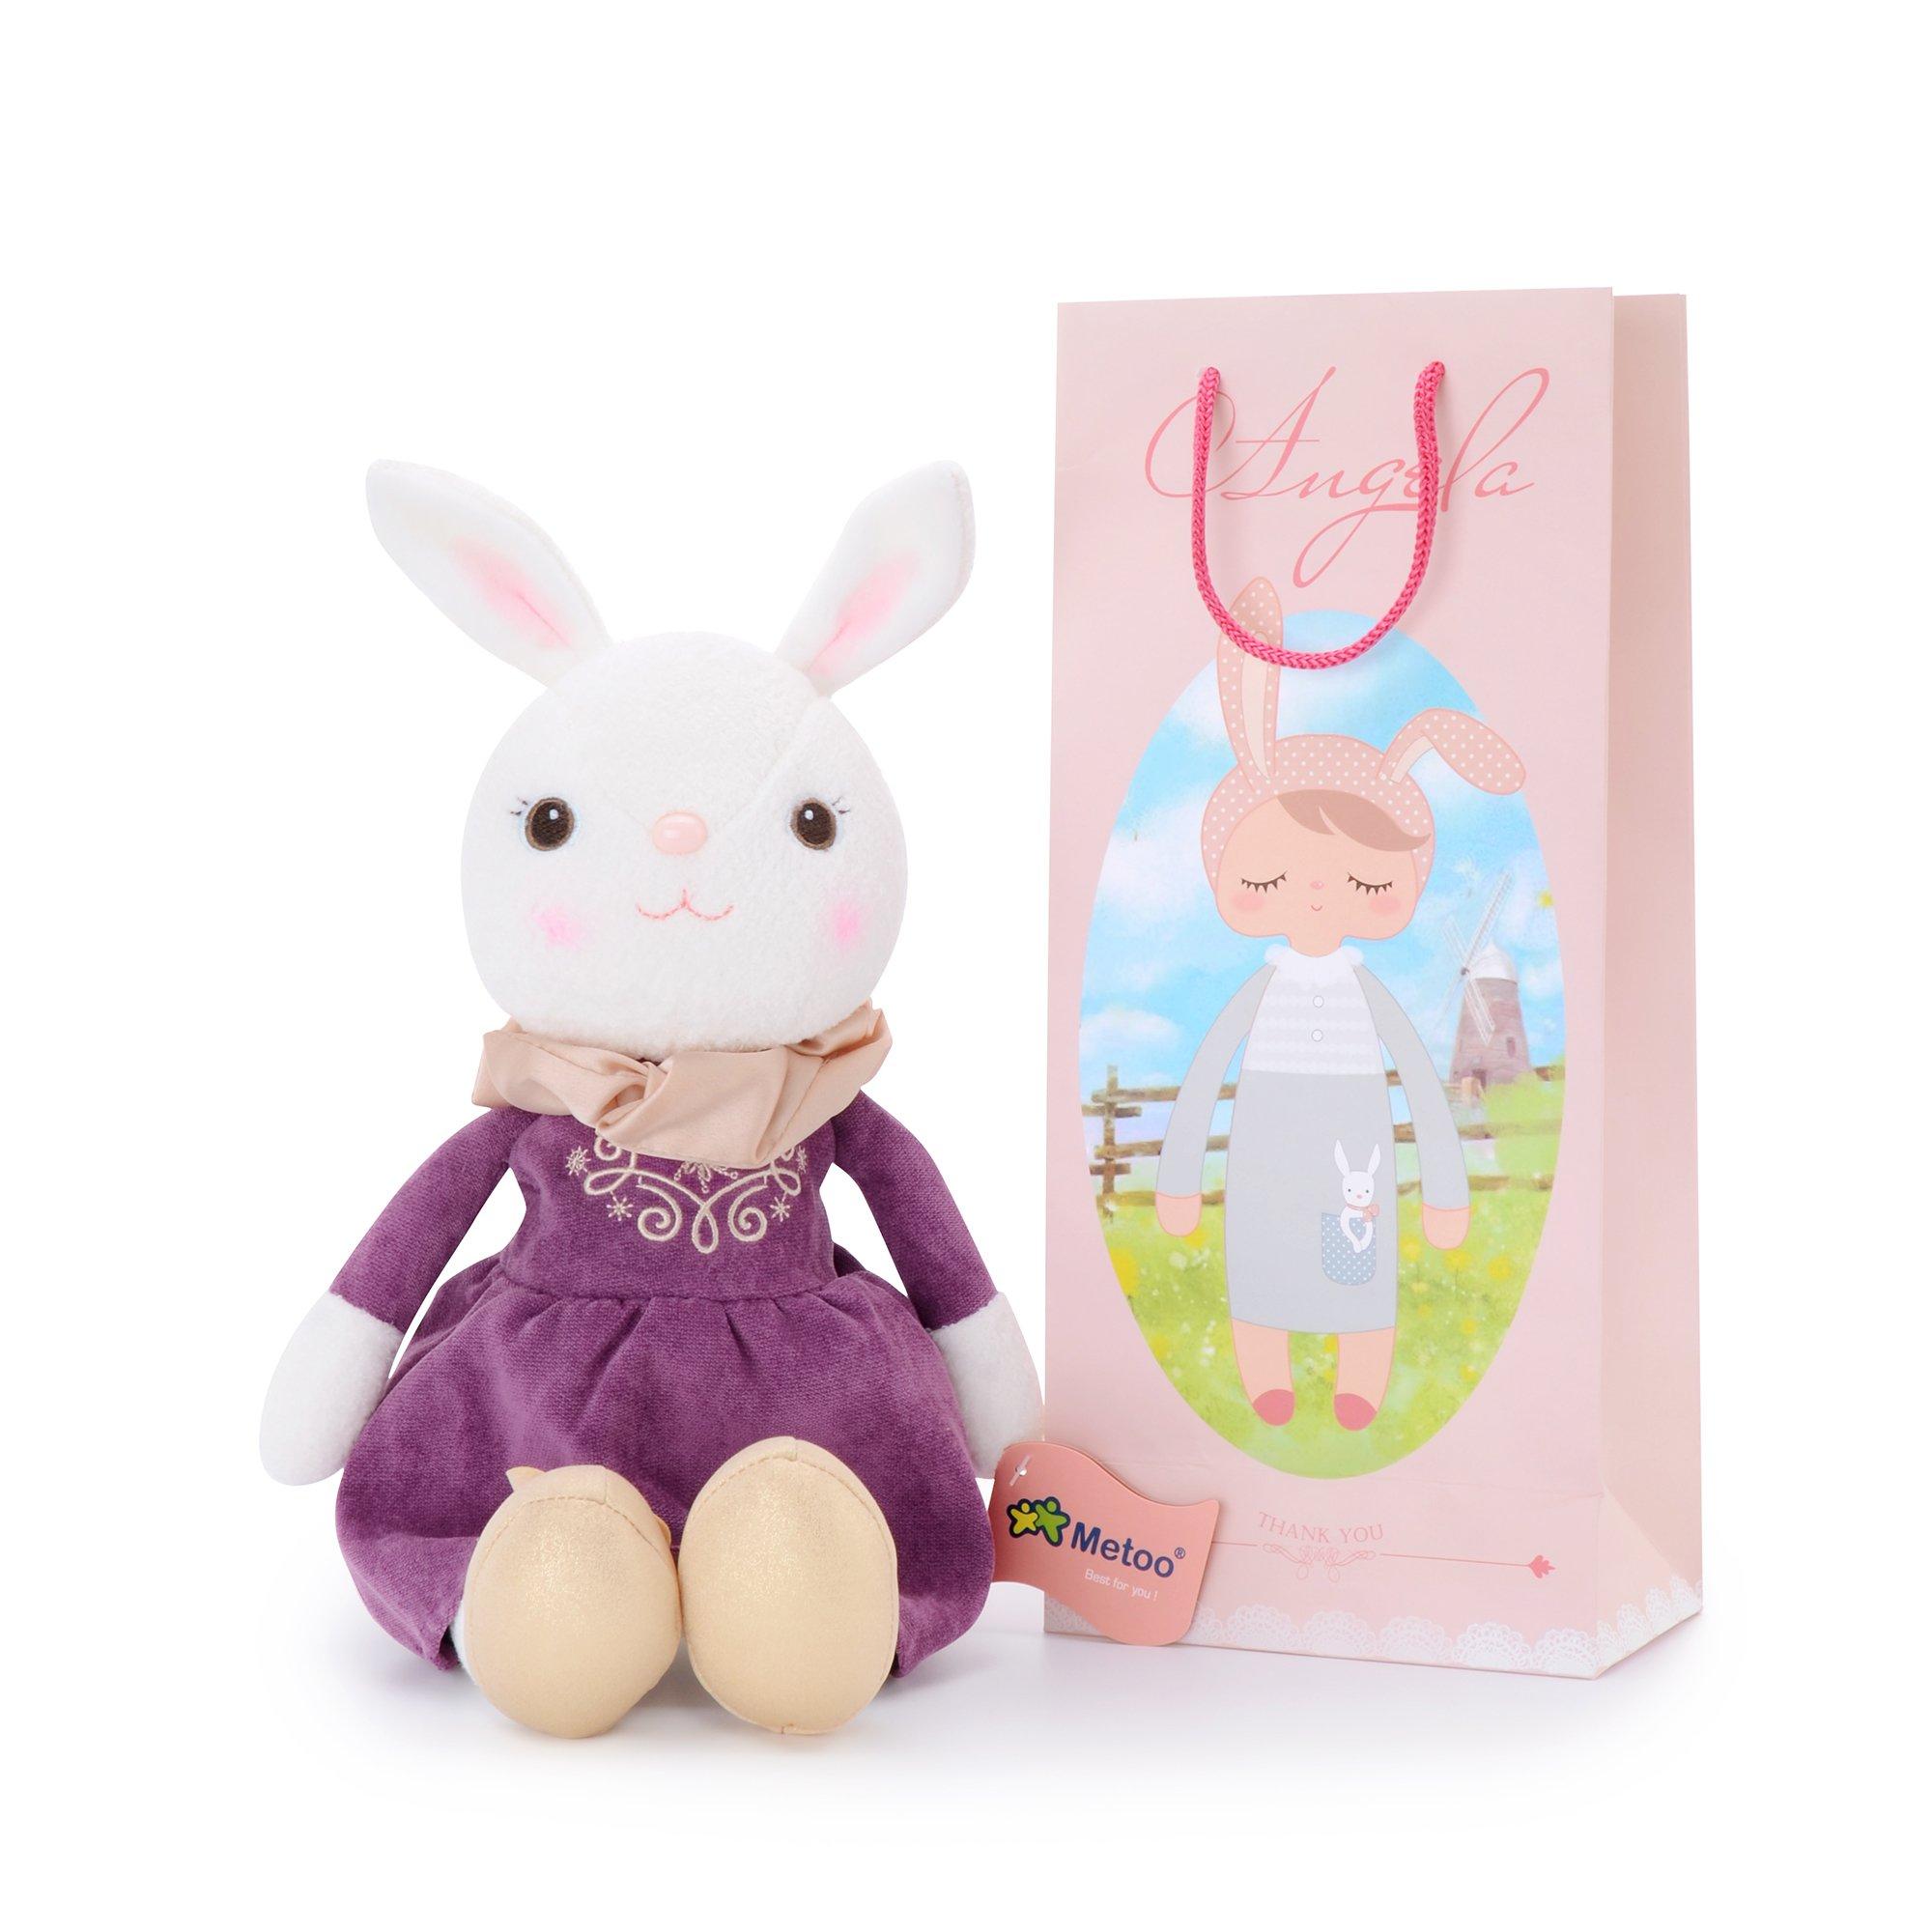 Me Too Tiramitu Stuffed Bunny Plush Rabbit Dolls Toys Dress 16 Inches+Gift Bag